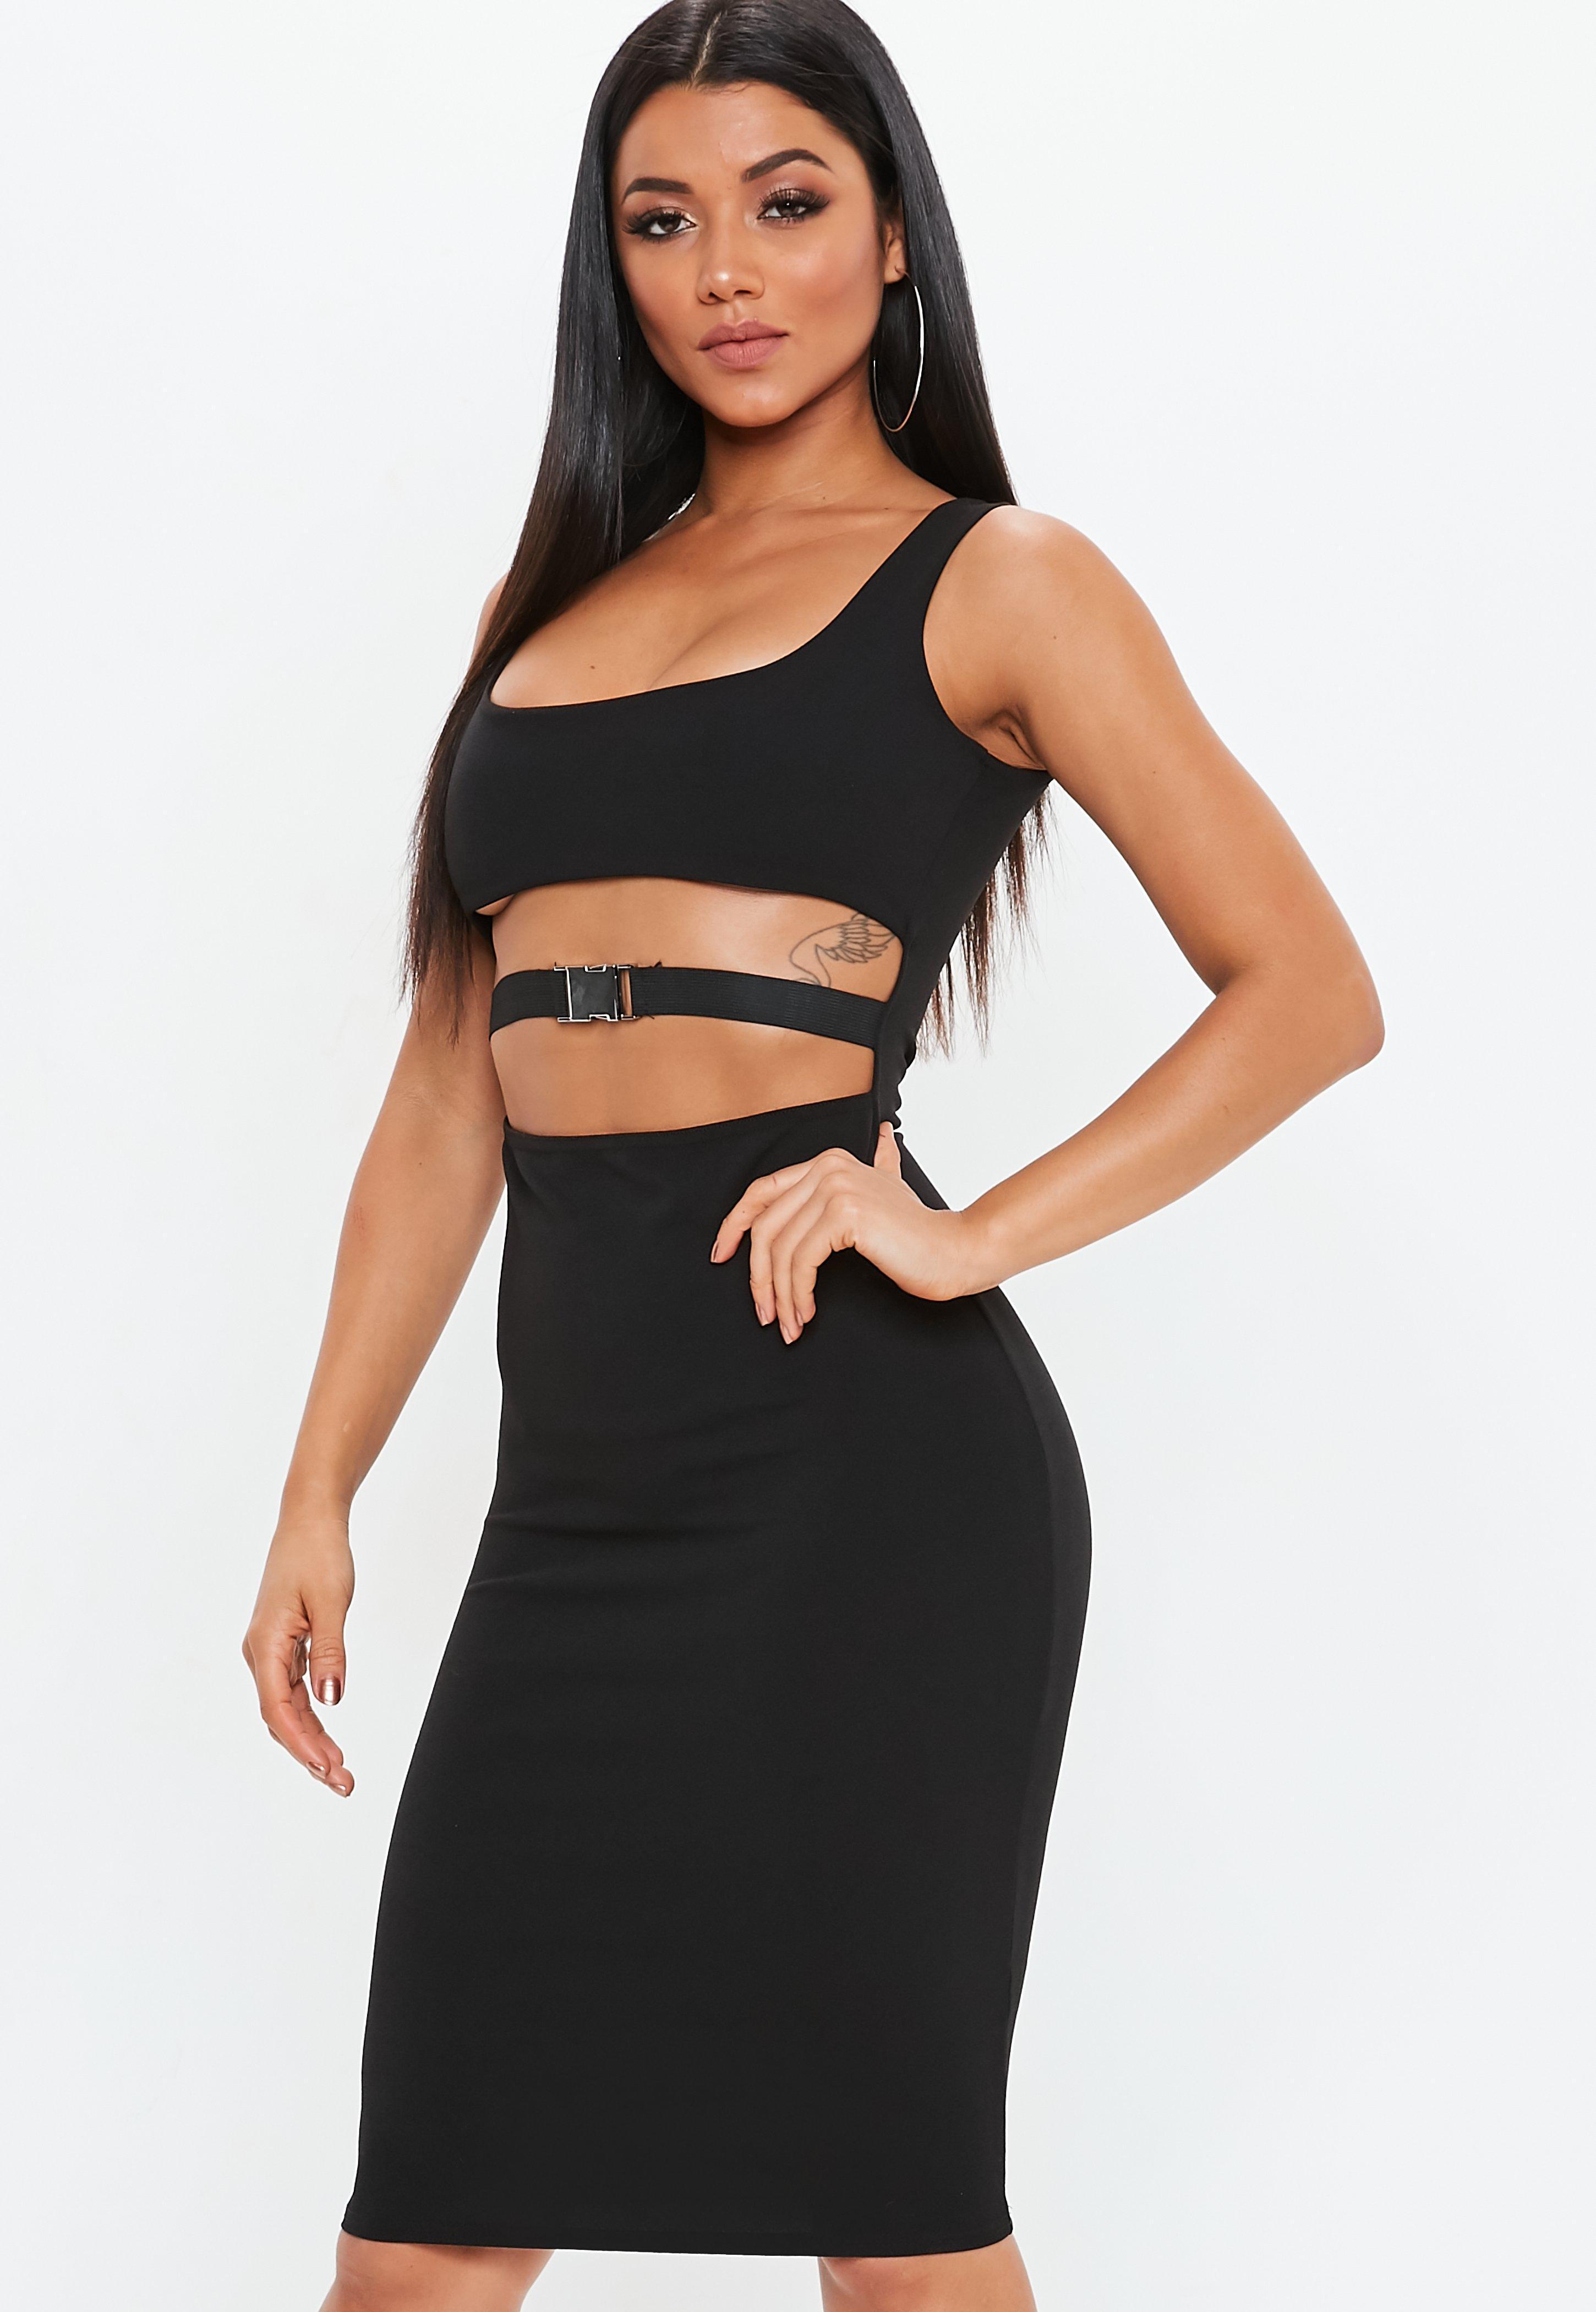 dfaa6eef9f02a Missguided Black Cut Out Detail Midi Dress in Black - Lyst